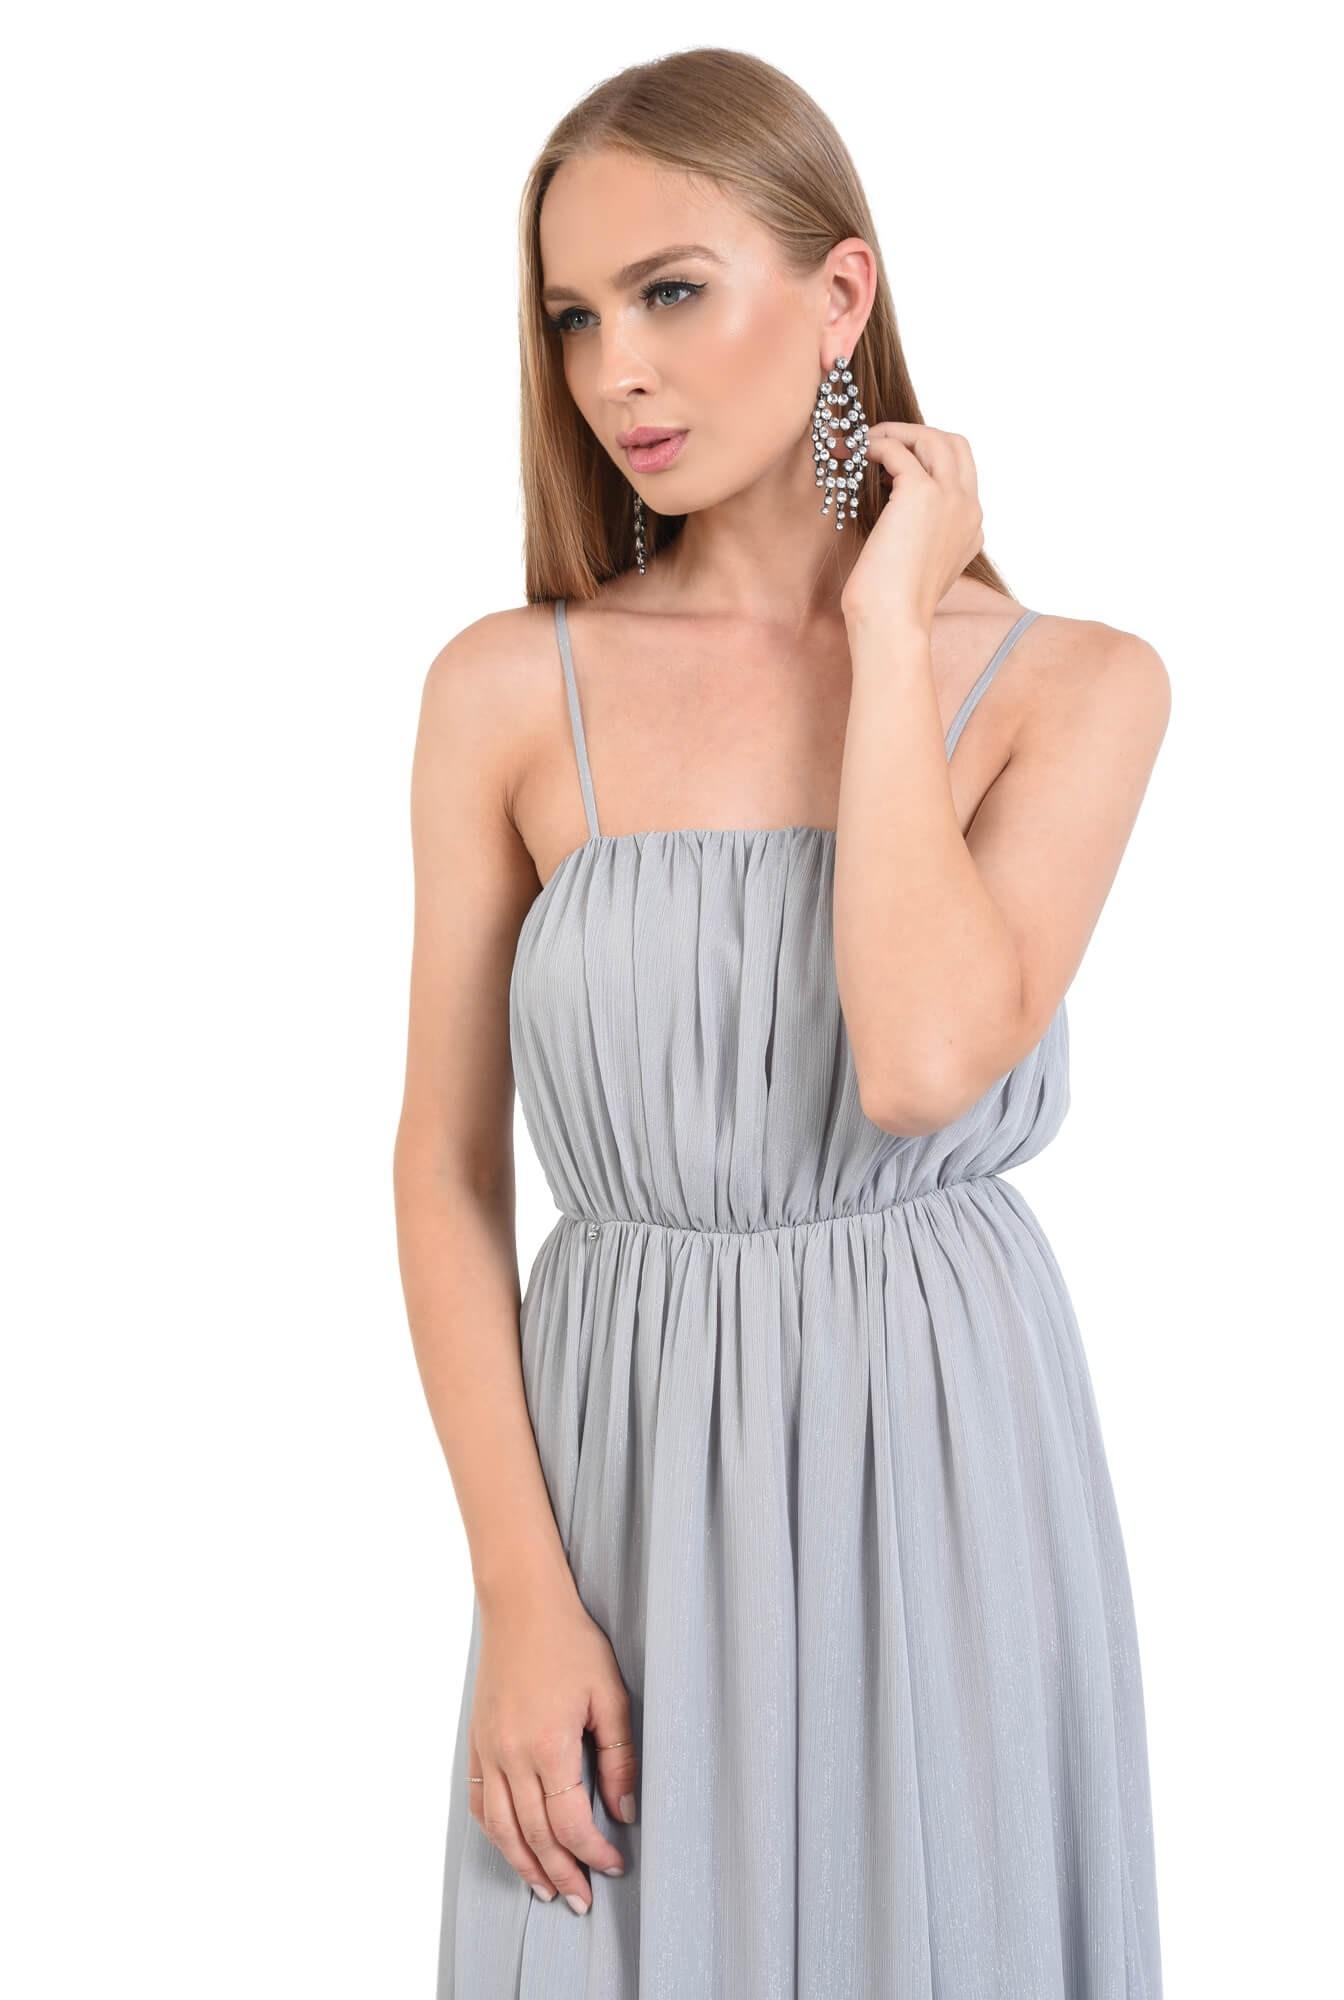 0 - rochie de seara, pliuri, argintiu, lunga, voal